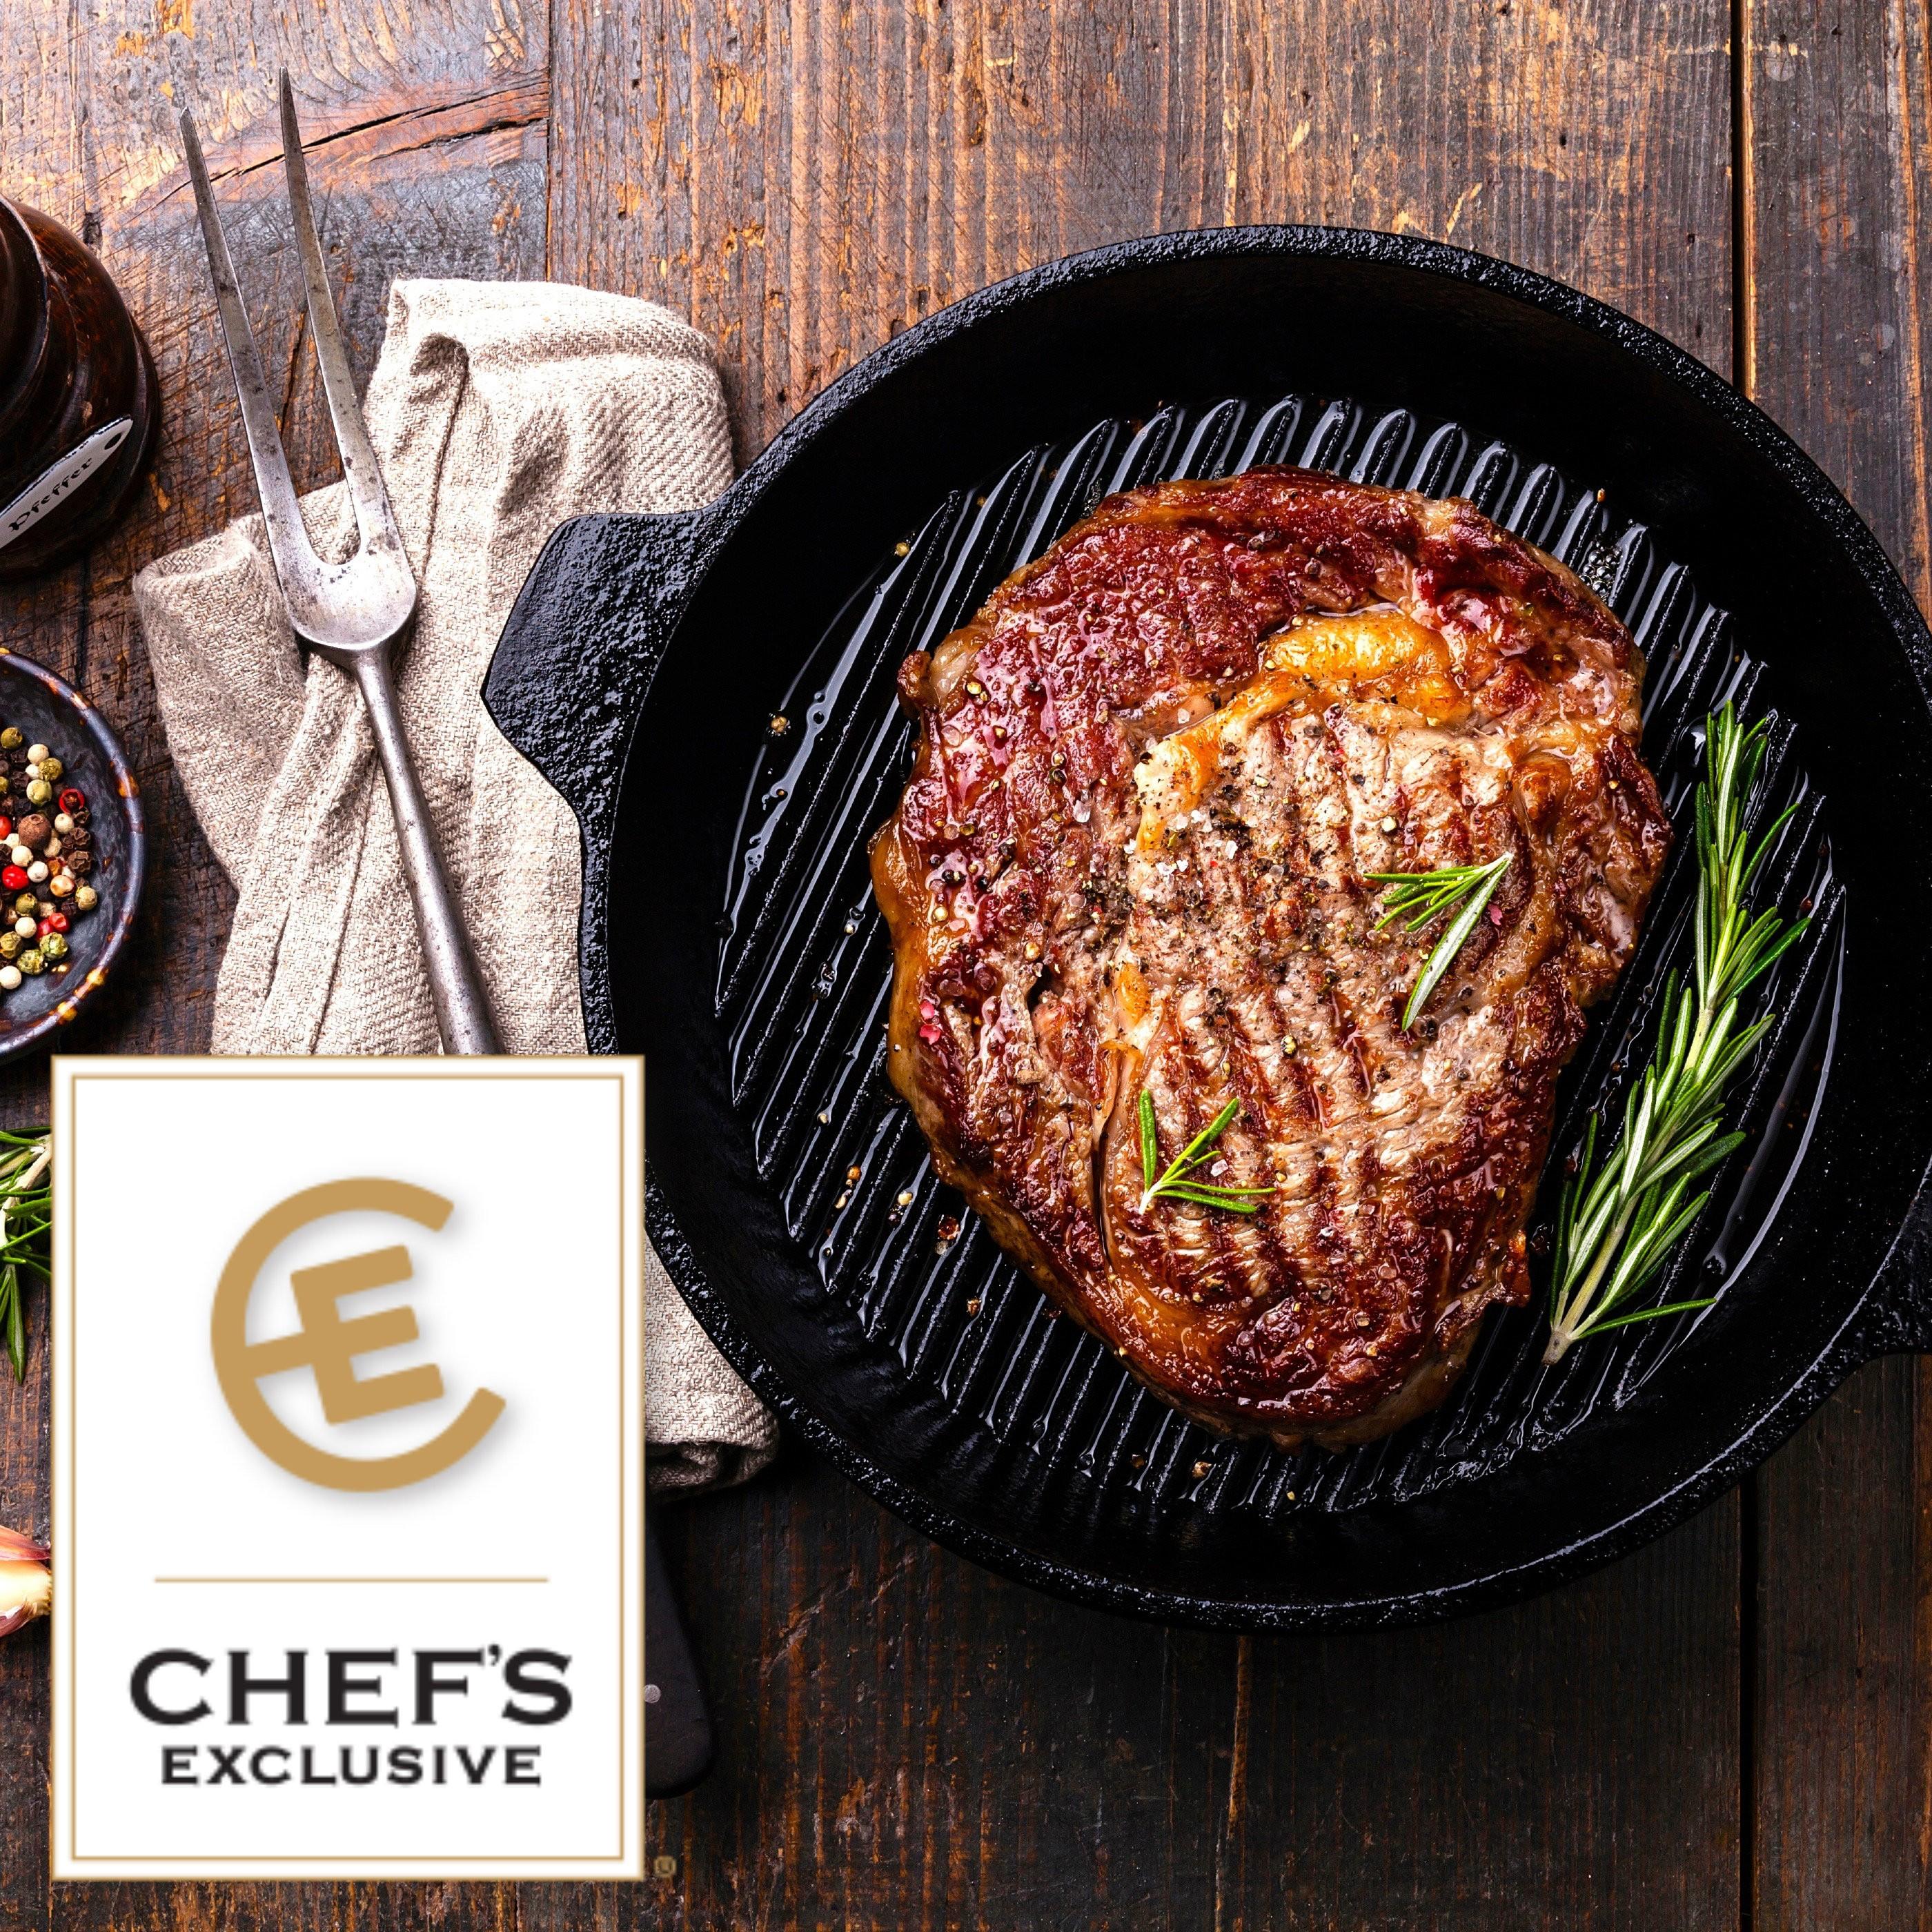 USDA Prime Ribeye. Chefs Exclusive